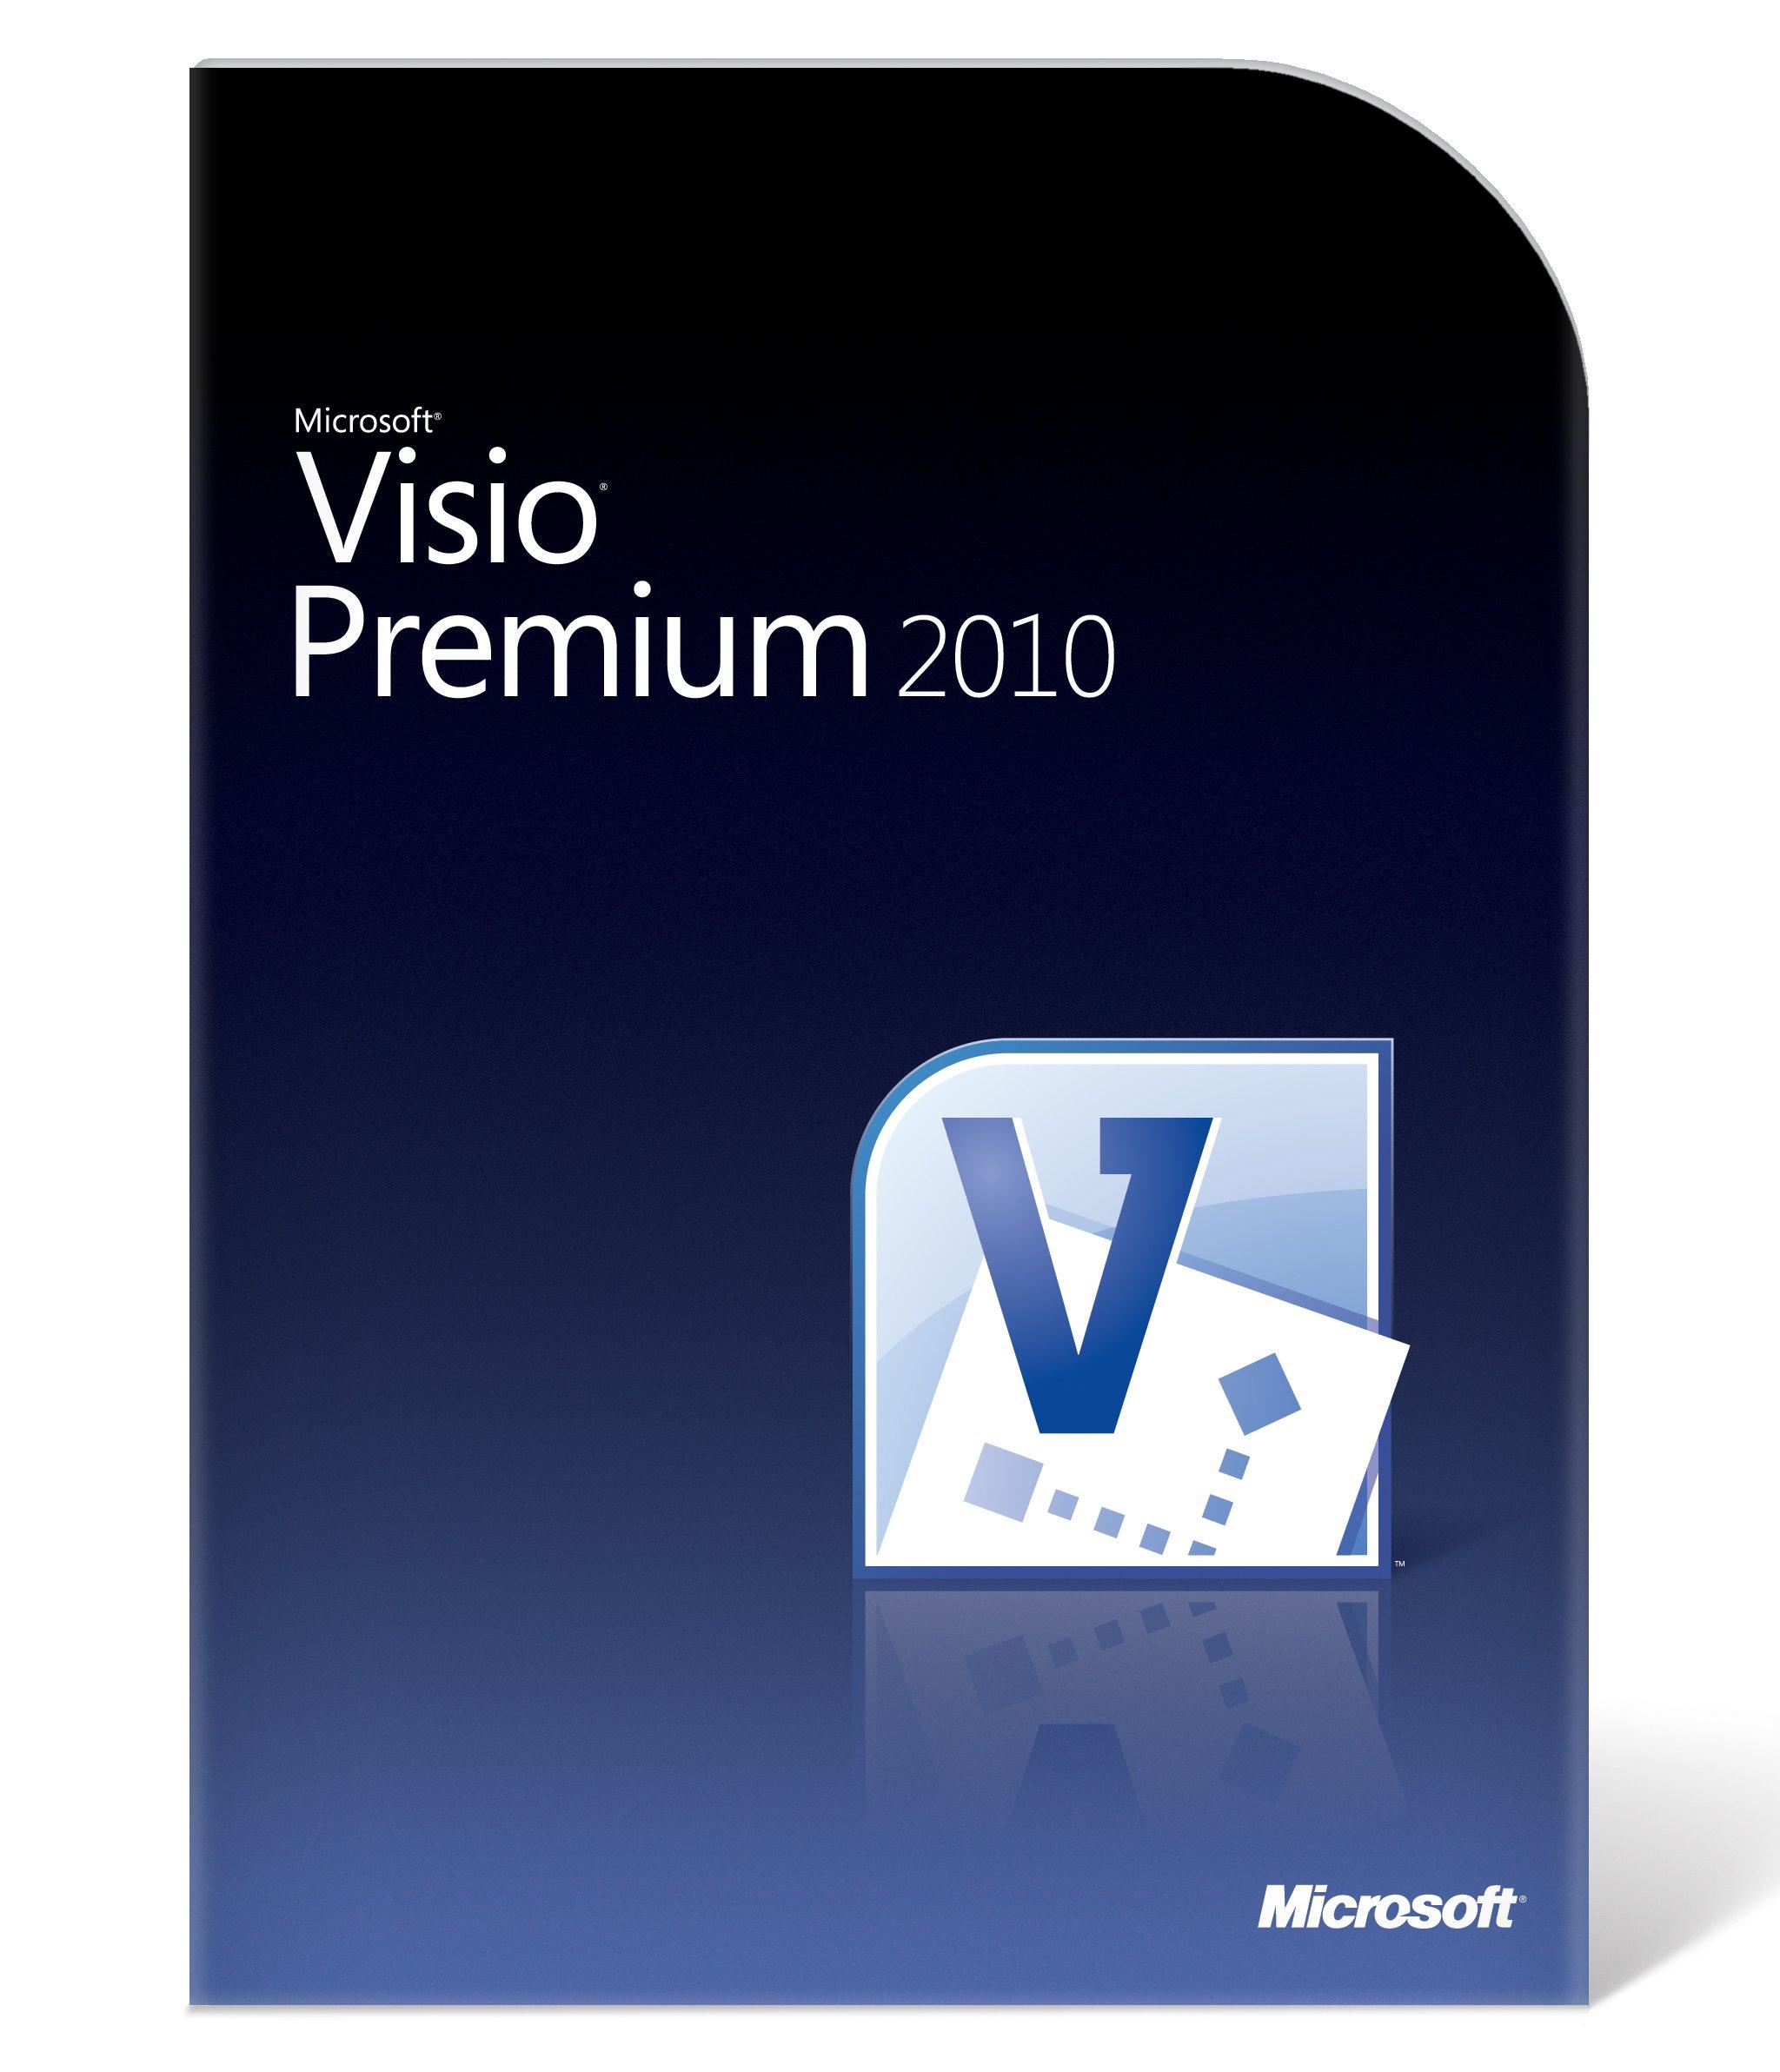 Microsoft Visio Premium 2010 by Microsoft